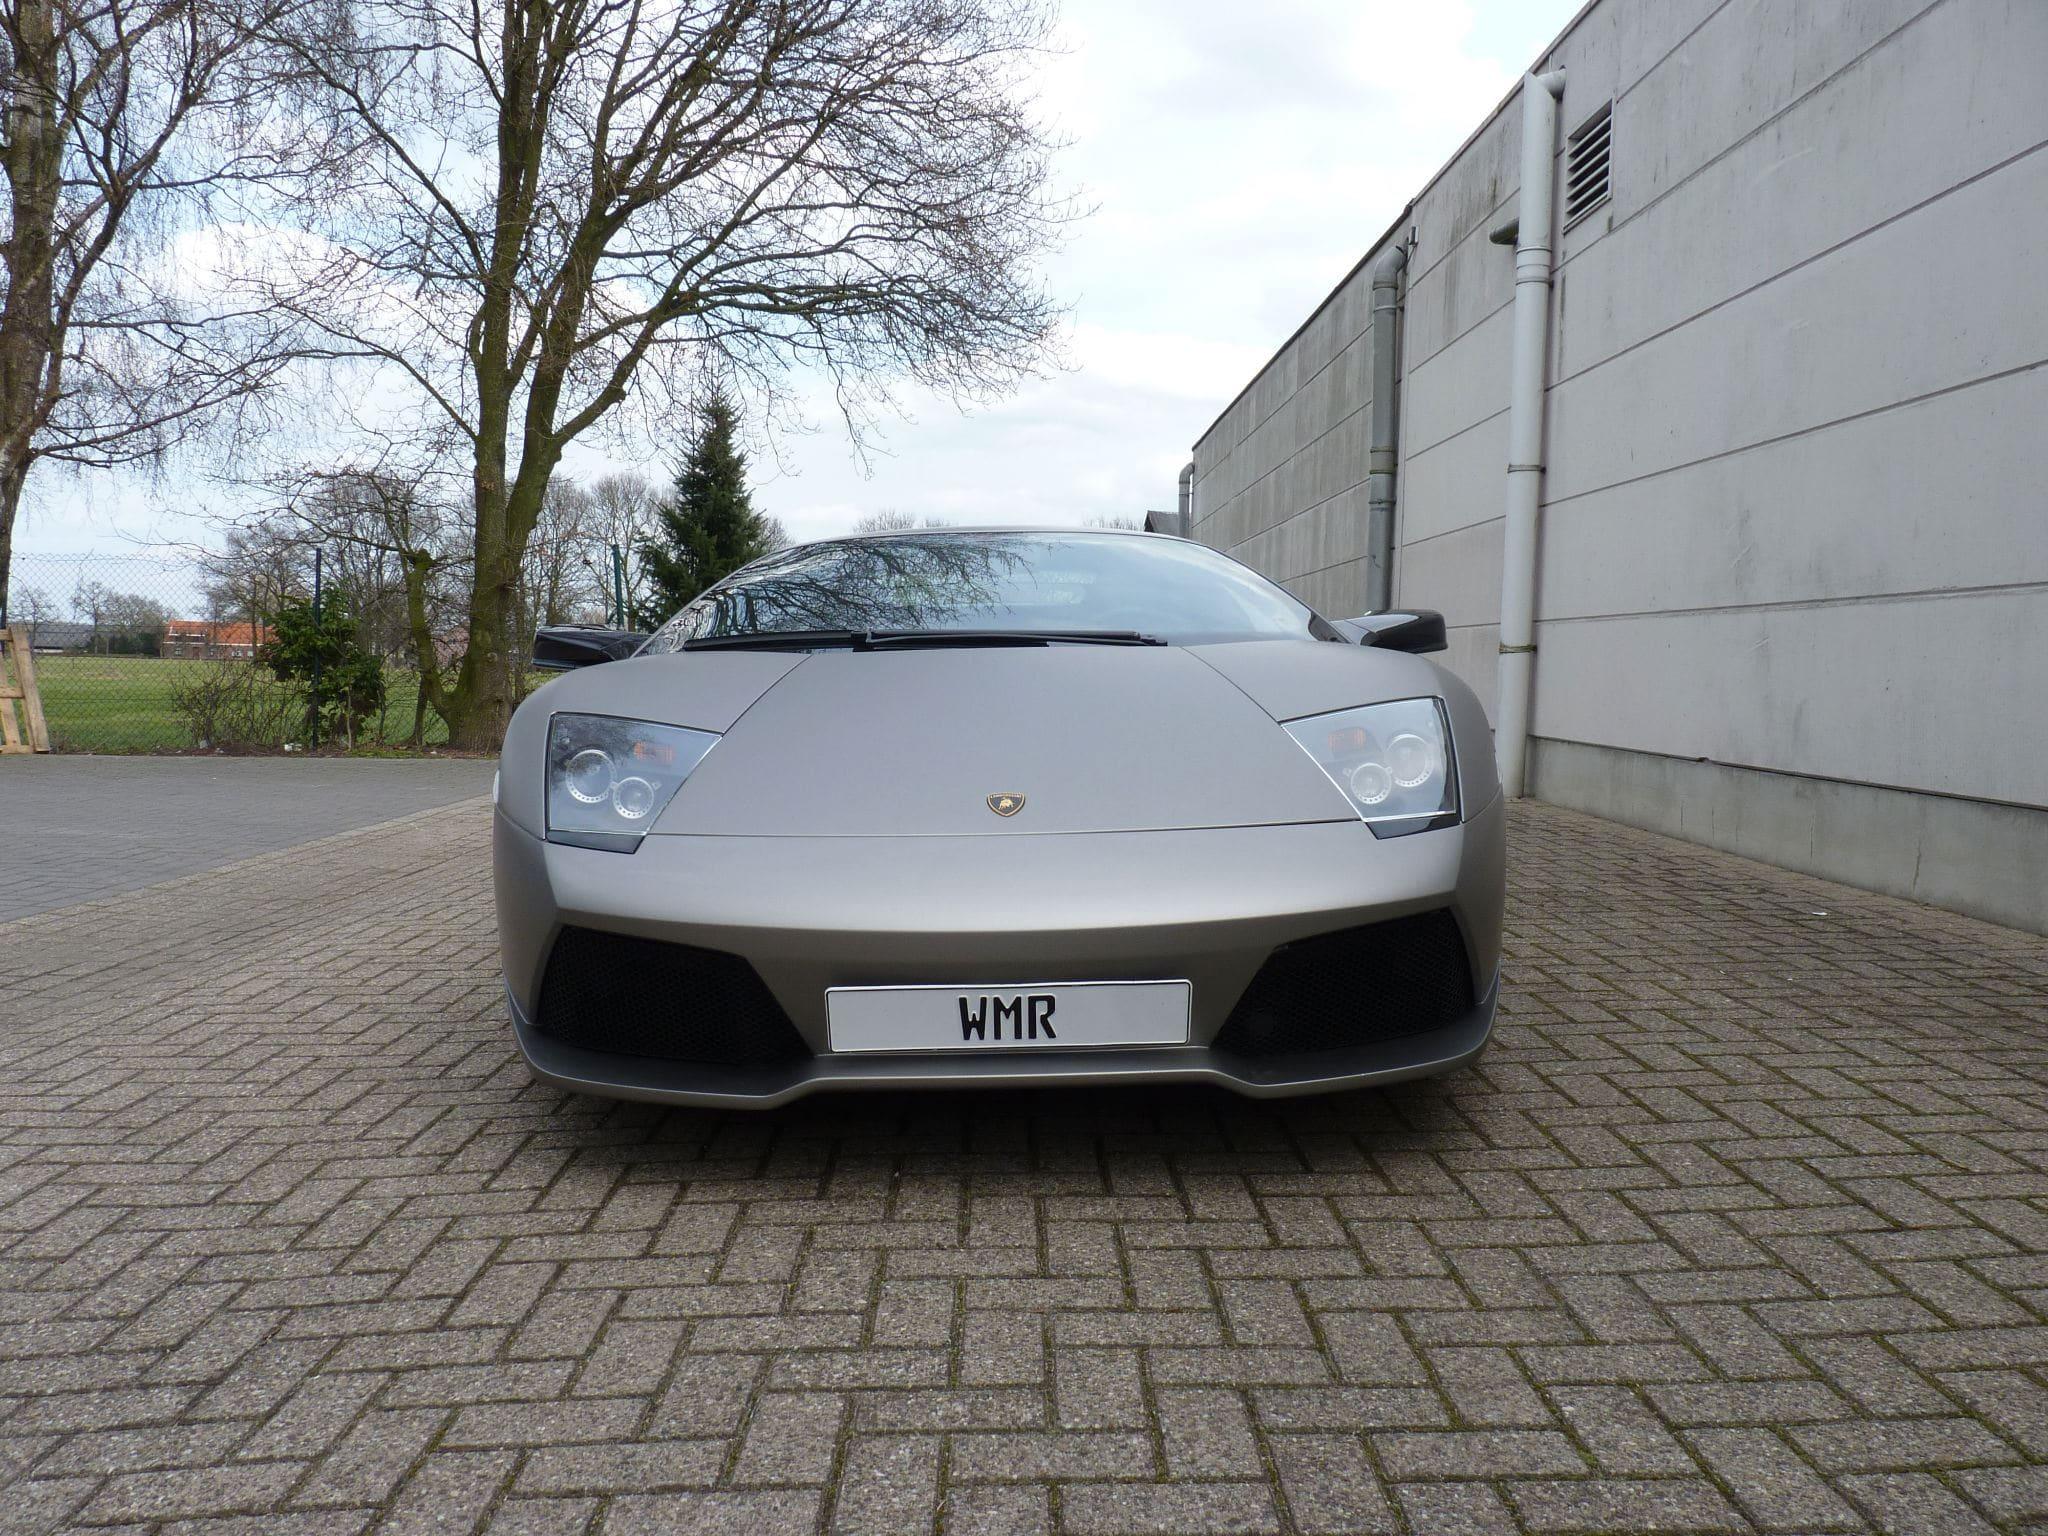 Lamborghini Murcialago LP670 met Gunpowder Wrap, Carwrapping door Wrapmyride.nu Foto-nr:5992, ©2021